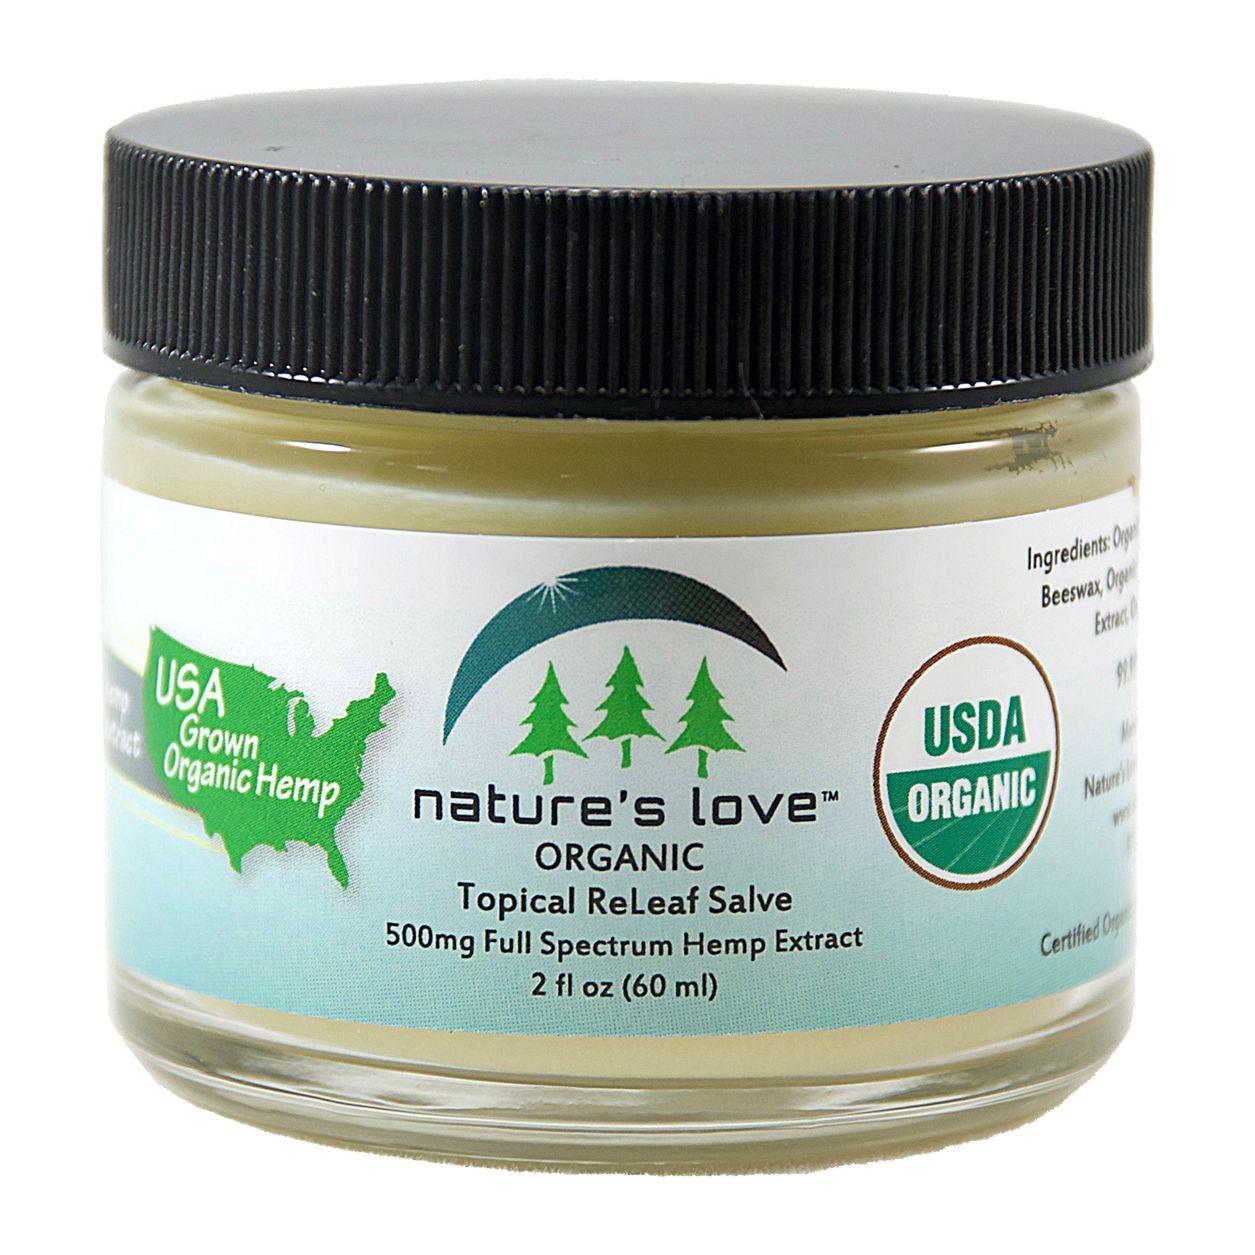 ReLeaf Organic Full-Spectrum Hemp Extract Salve Lemongrass 450 mg 2 fl. oz. (59 mL)